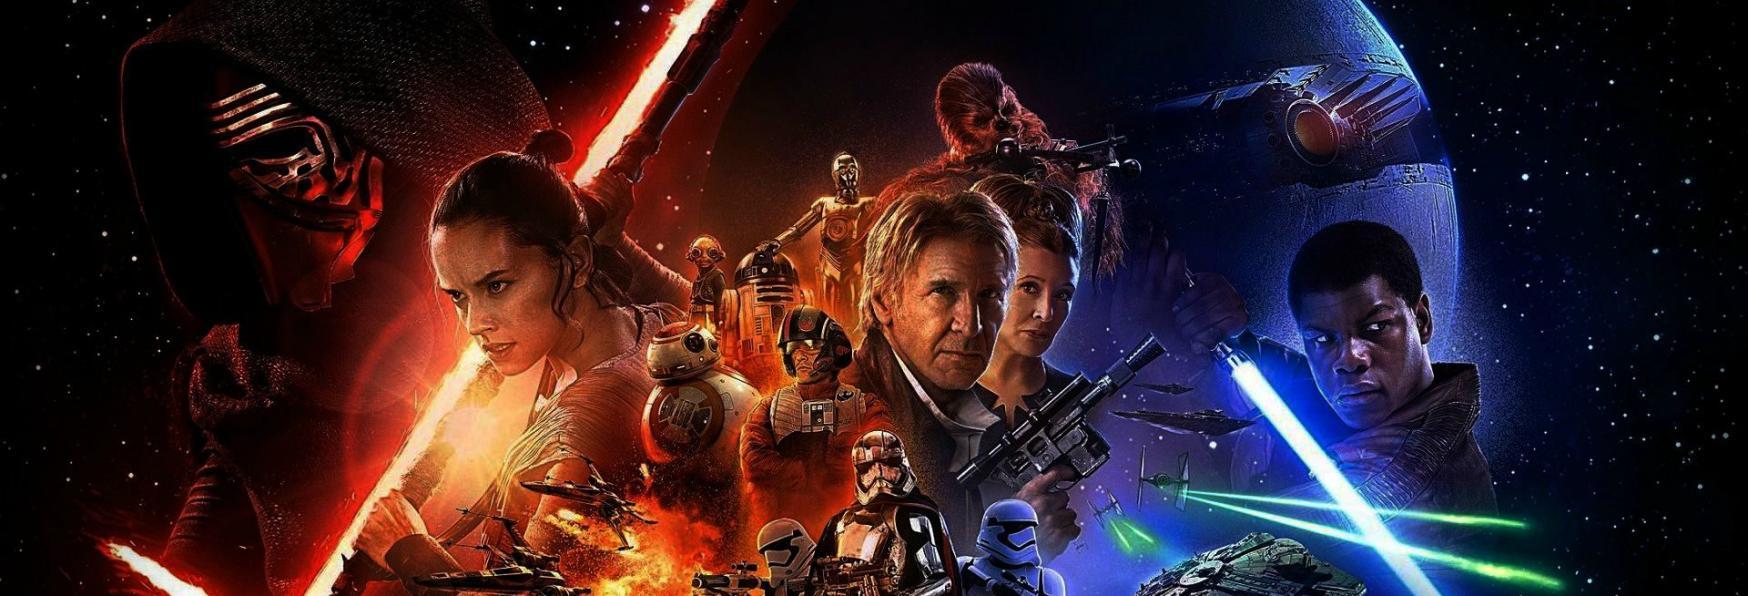 Confermata da Lucasfilm una Serie TV di Disney+ su Star Wars